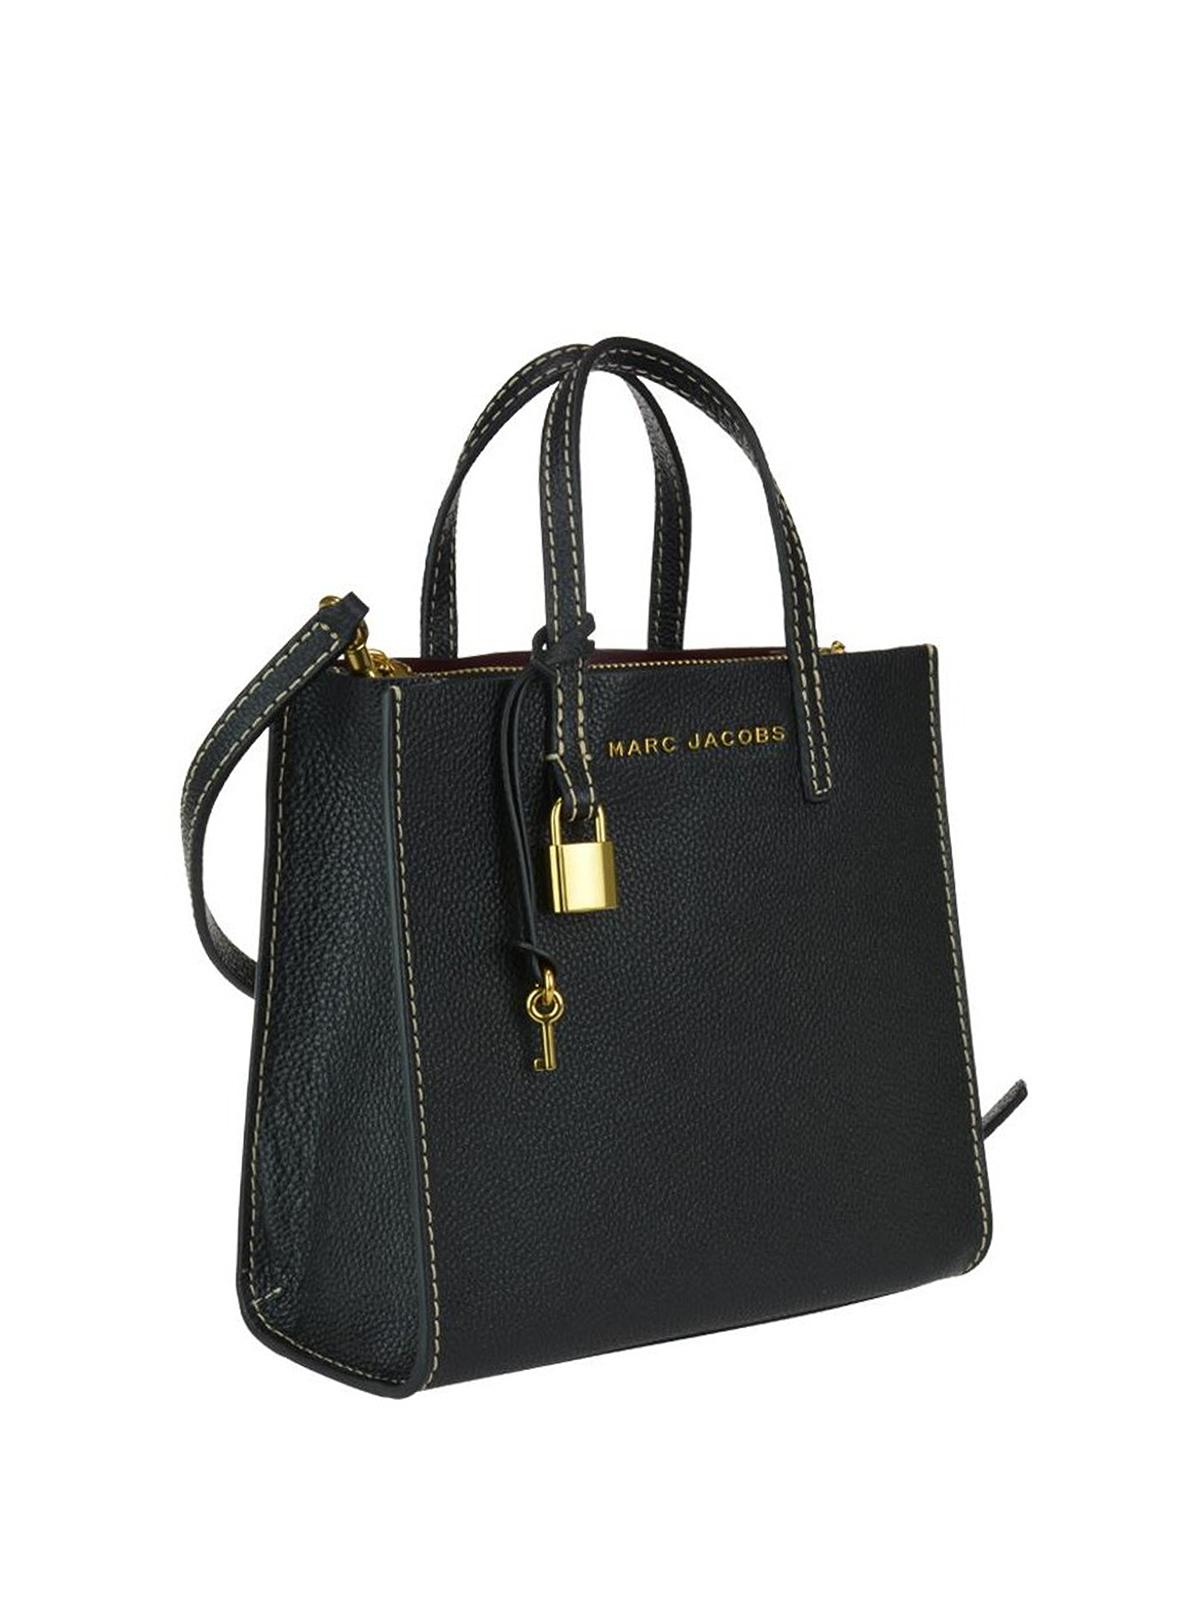 Marc Jacobs - The Mini Grind black bag - cross body bags - M0013268065